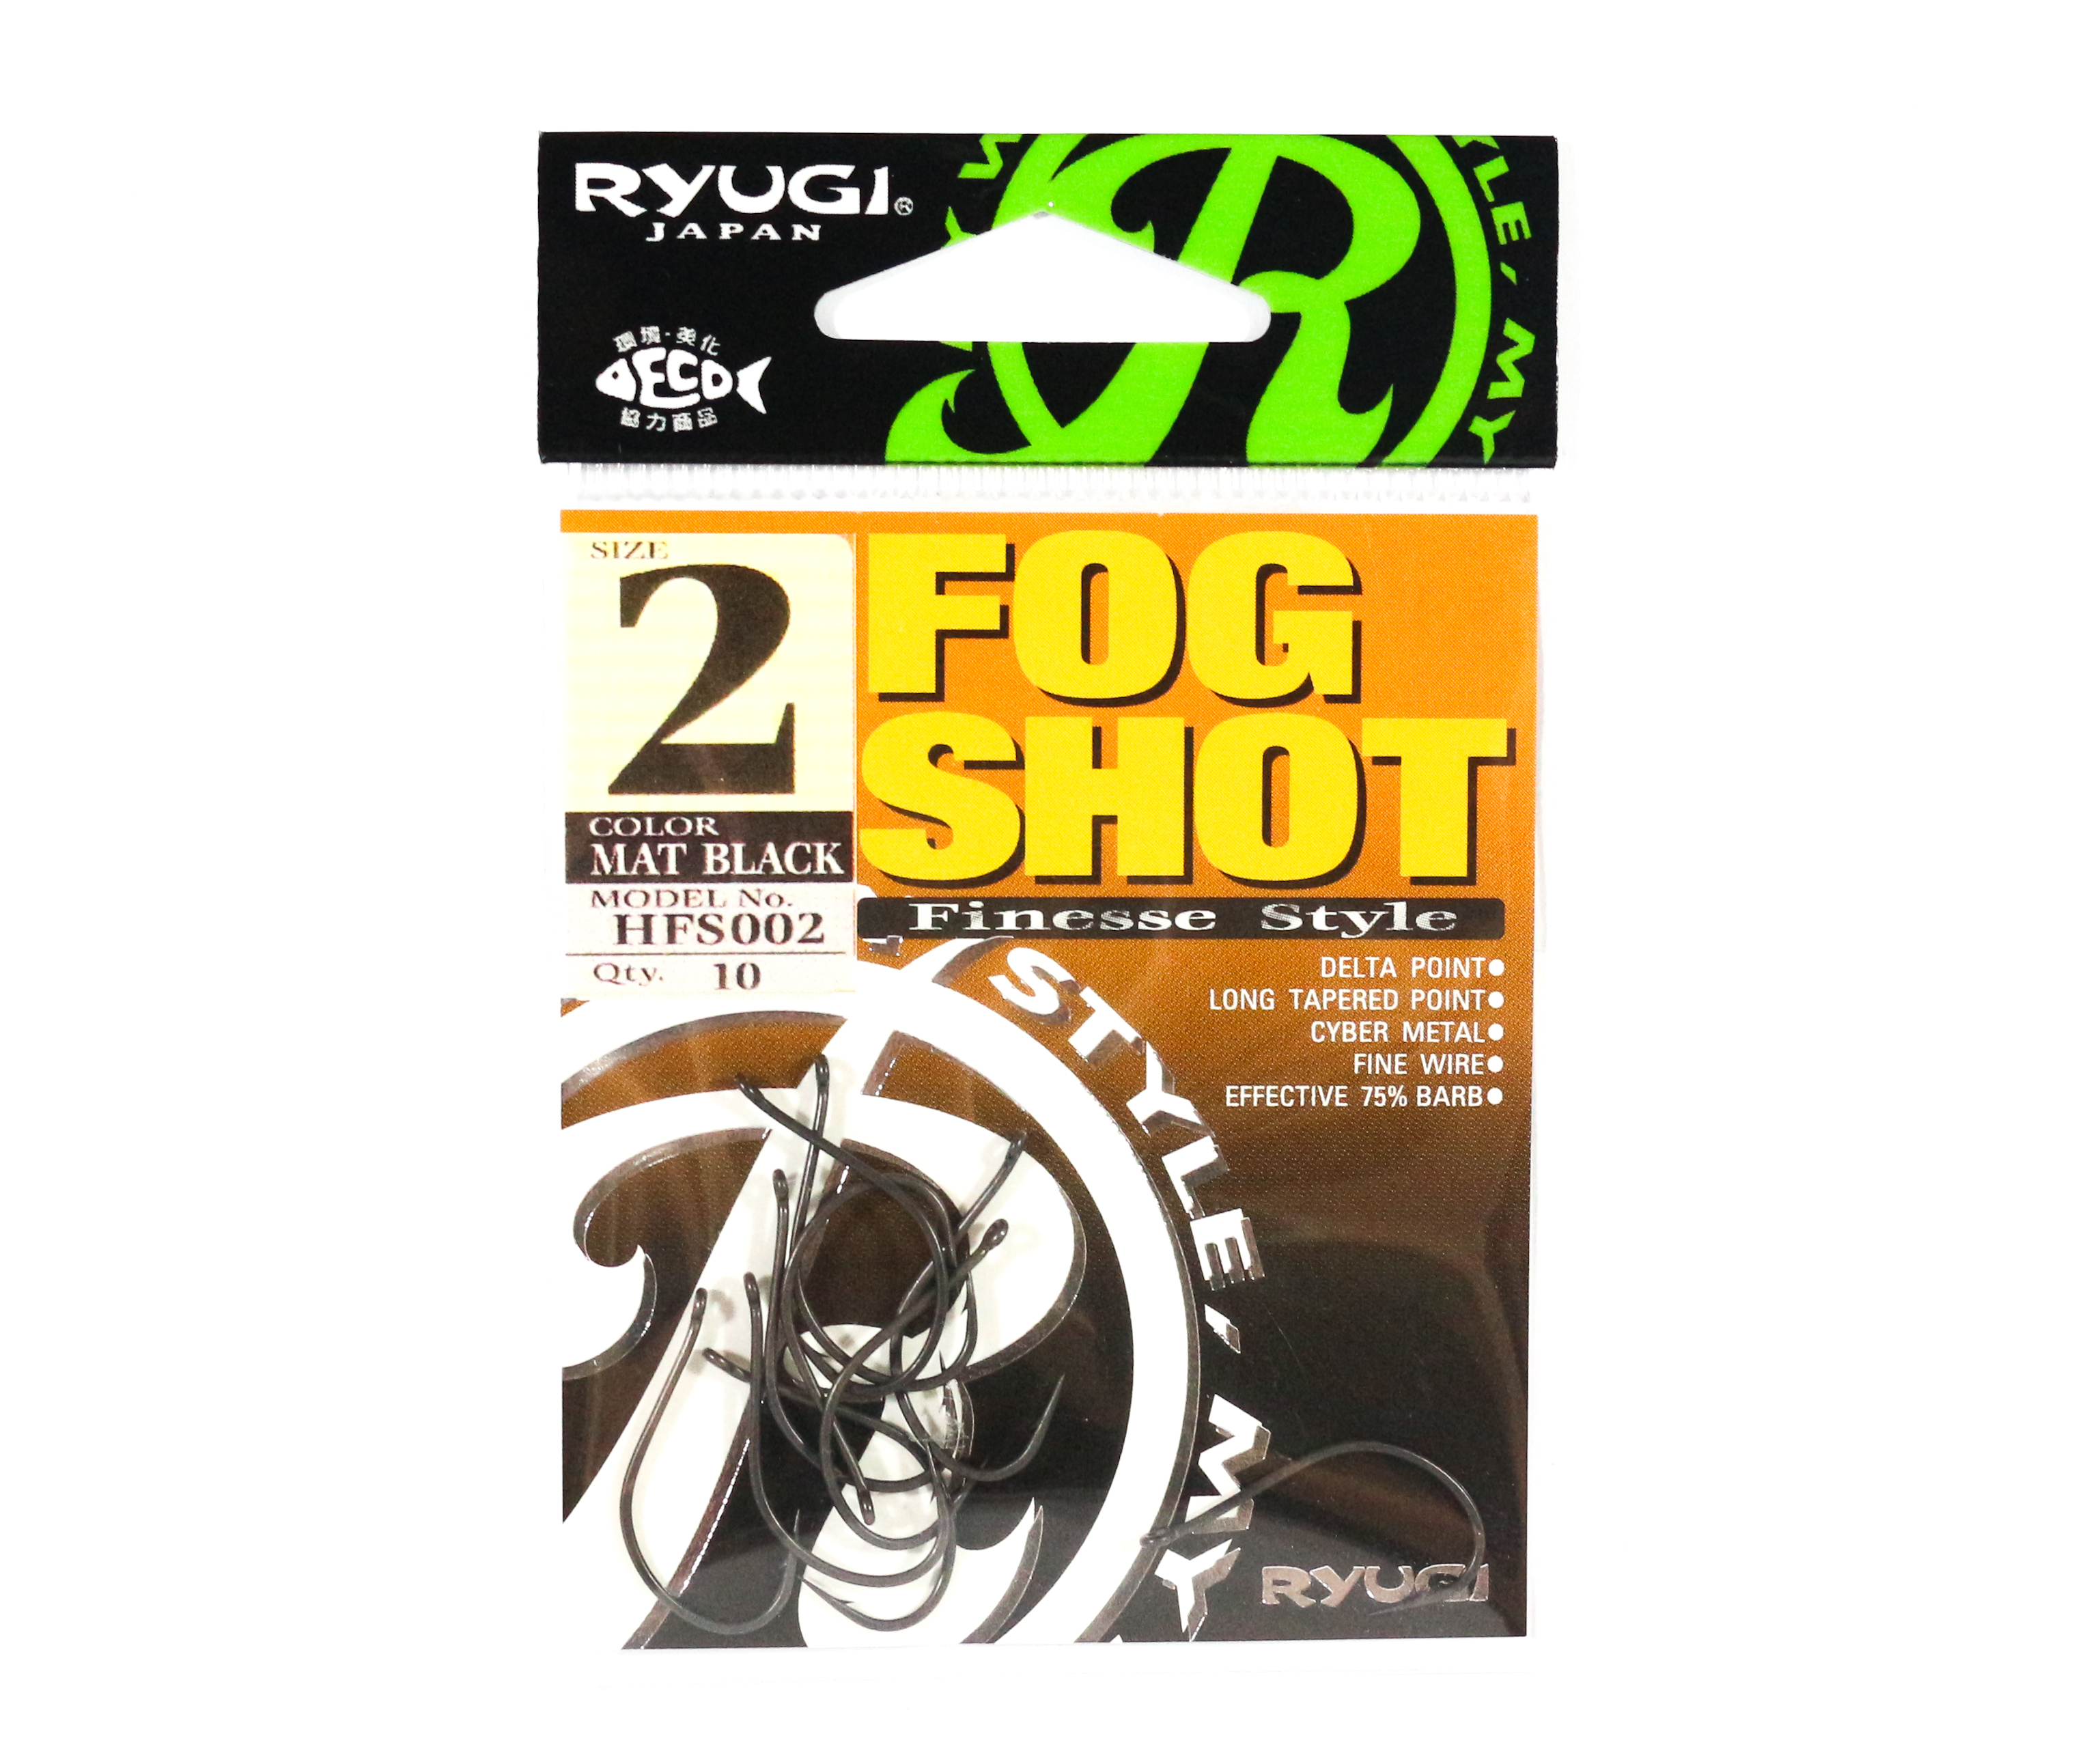 Ryugi HFS002 Fog Shot Finesse Hook Size 2 (0430)